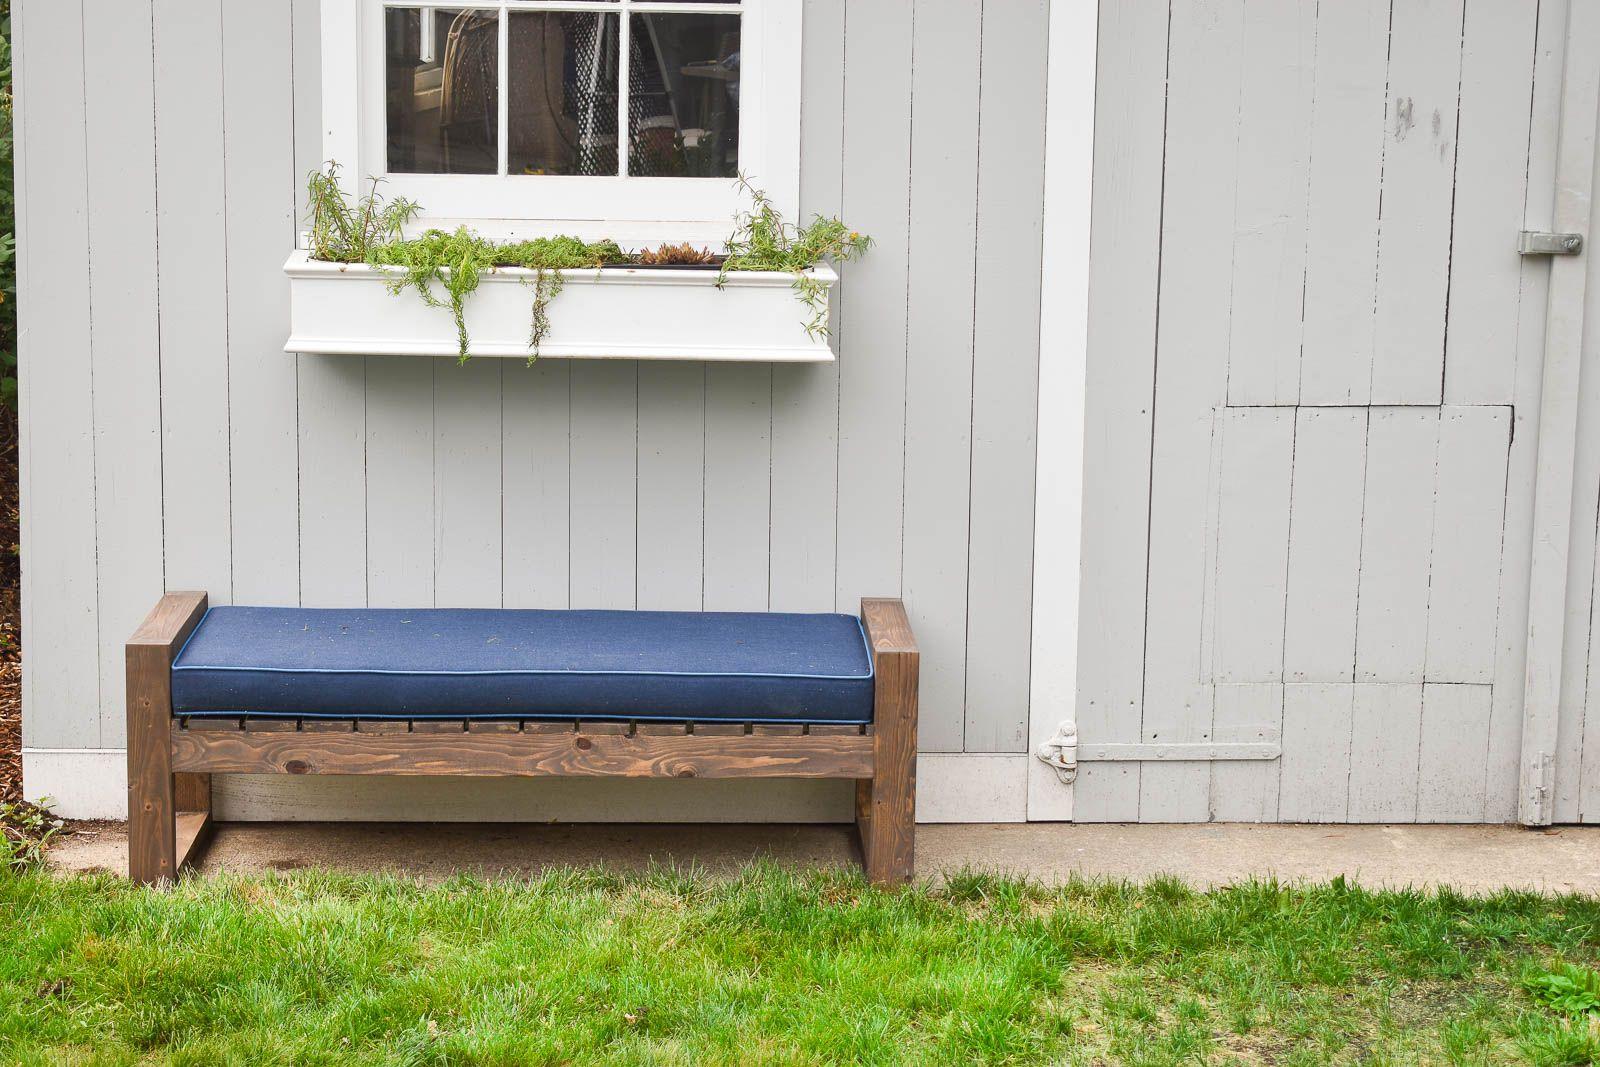 Brilliant How To Make A Modern Backyard Bench Outdoor Projects Inzonedesignstudio Interior Chair Design Inzonedesignstudiocom